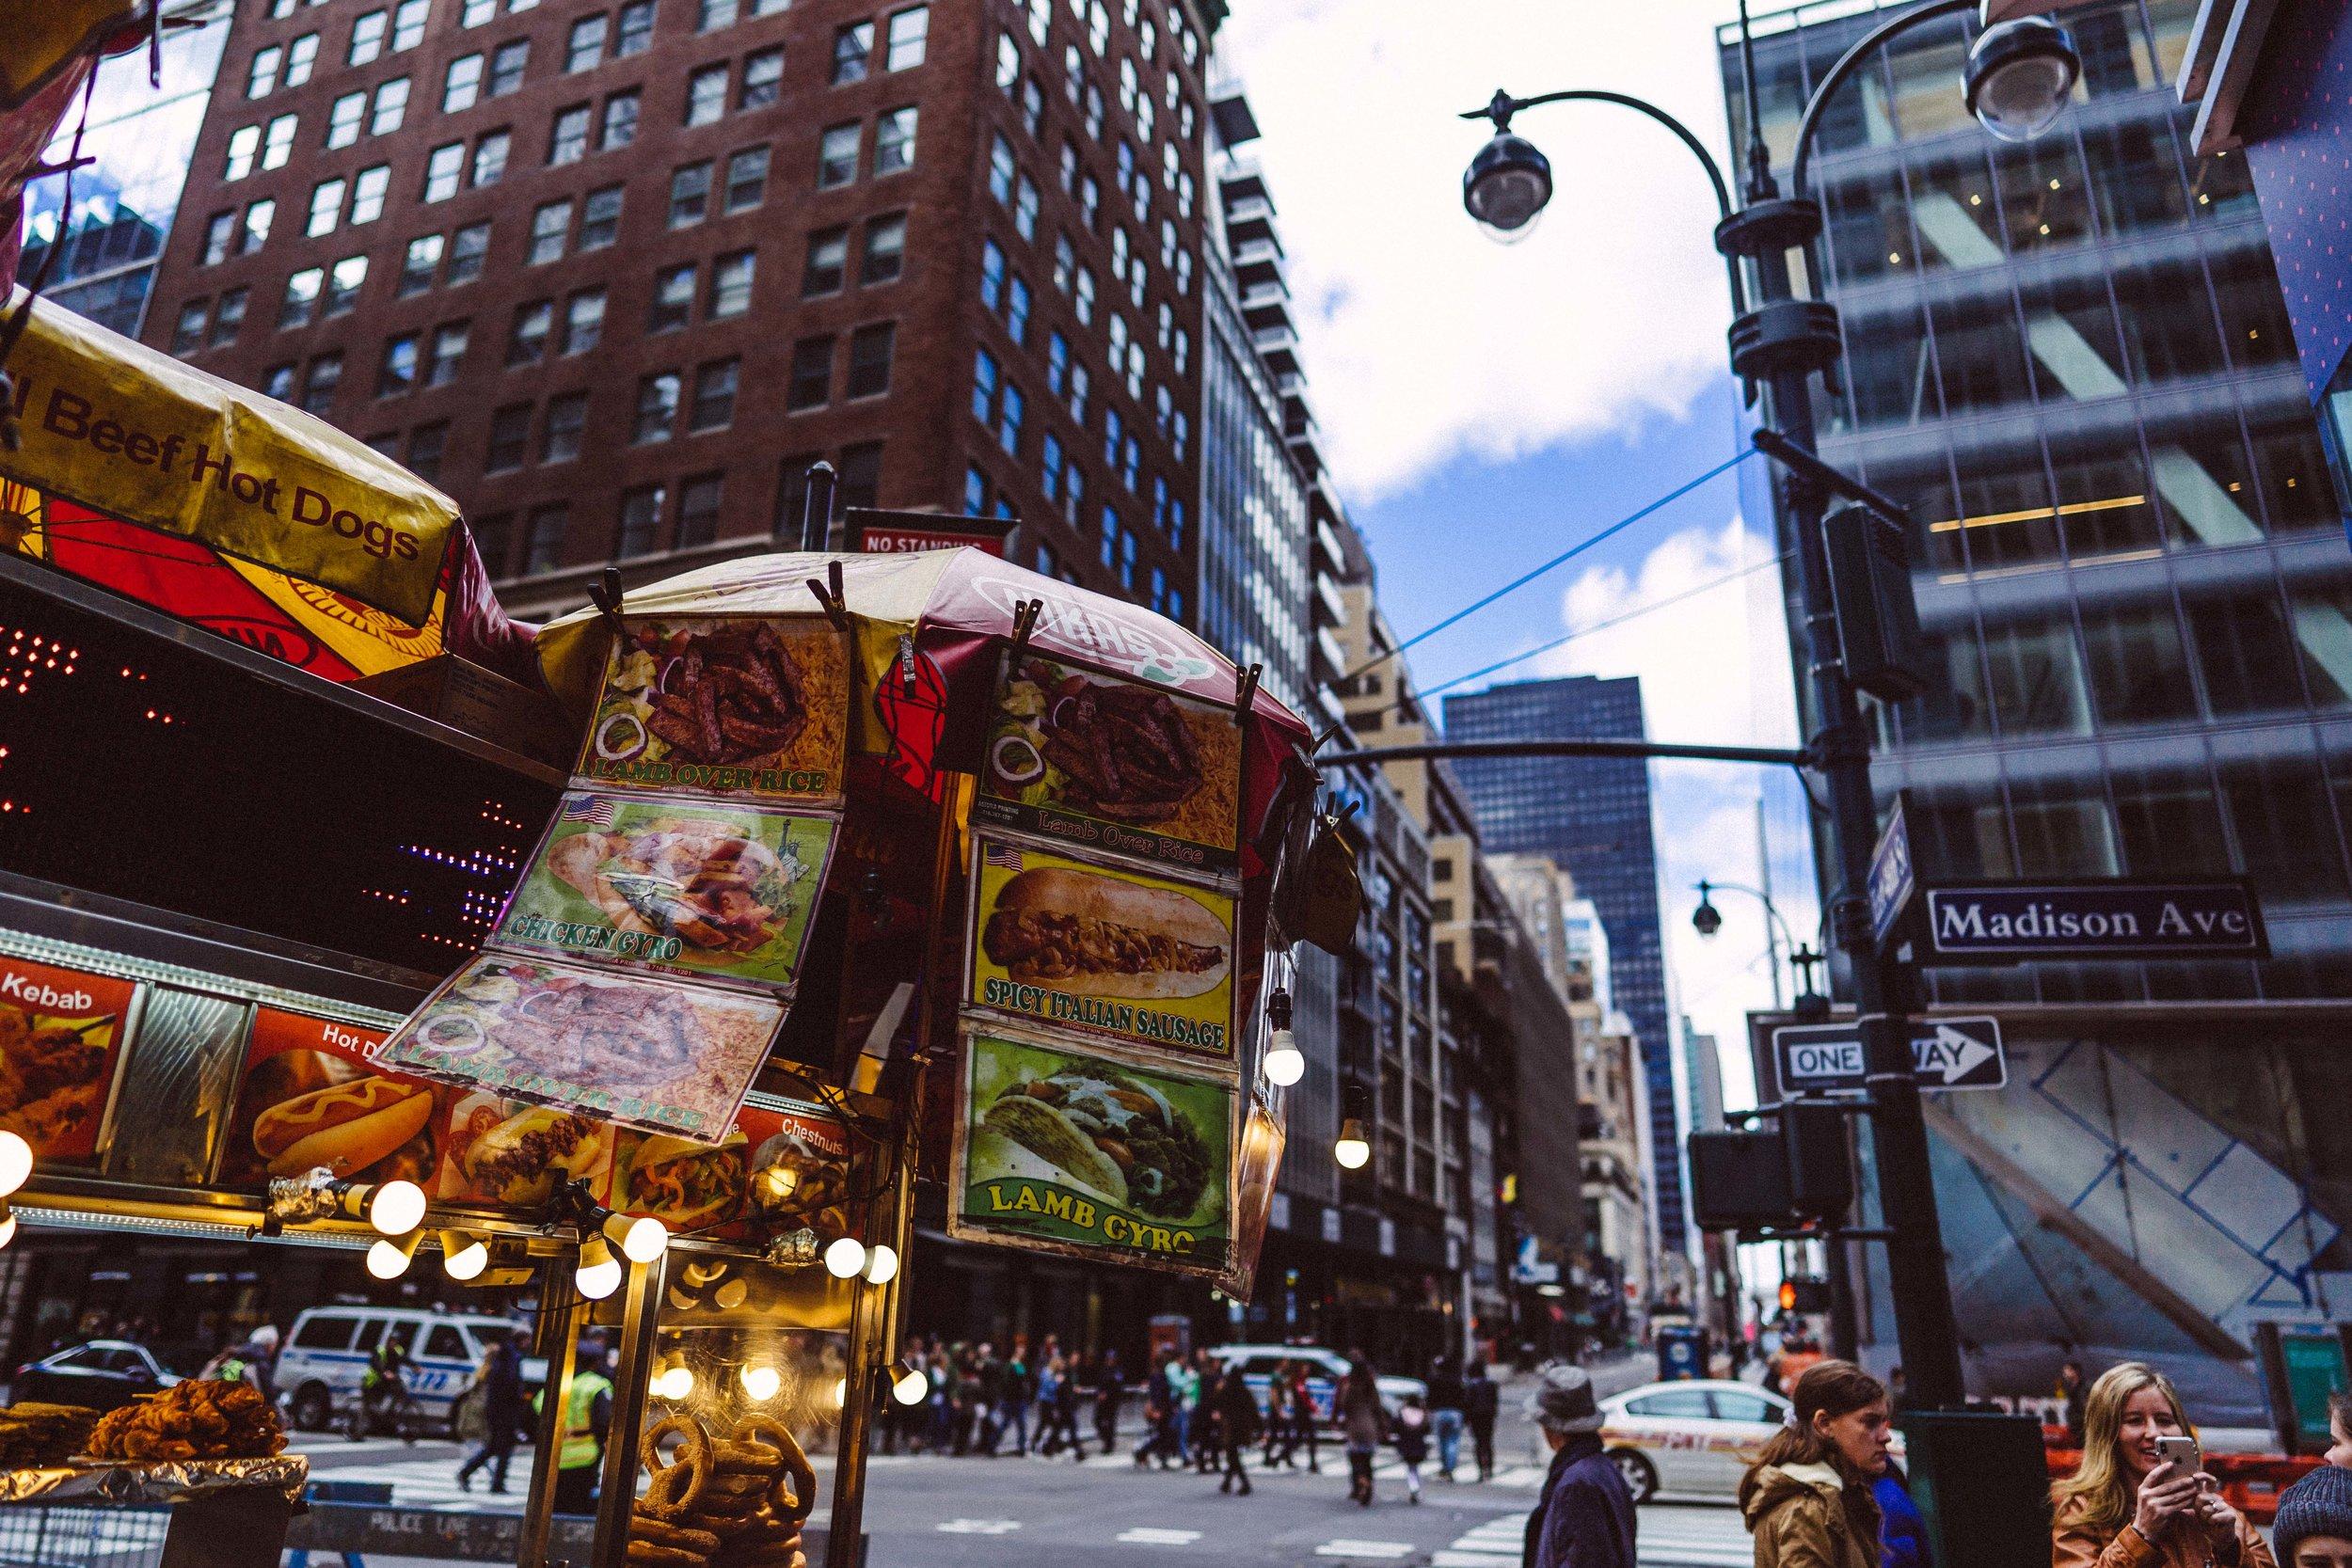 newyork-sony-103027.jpg